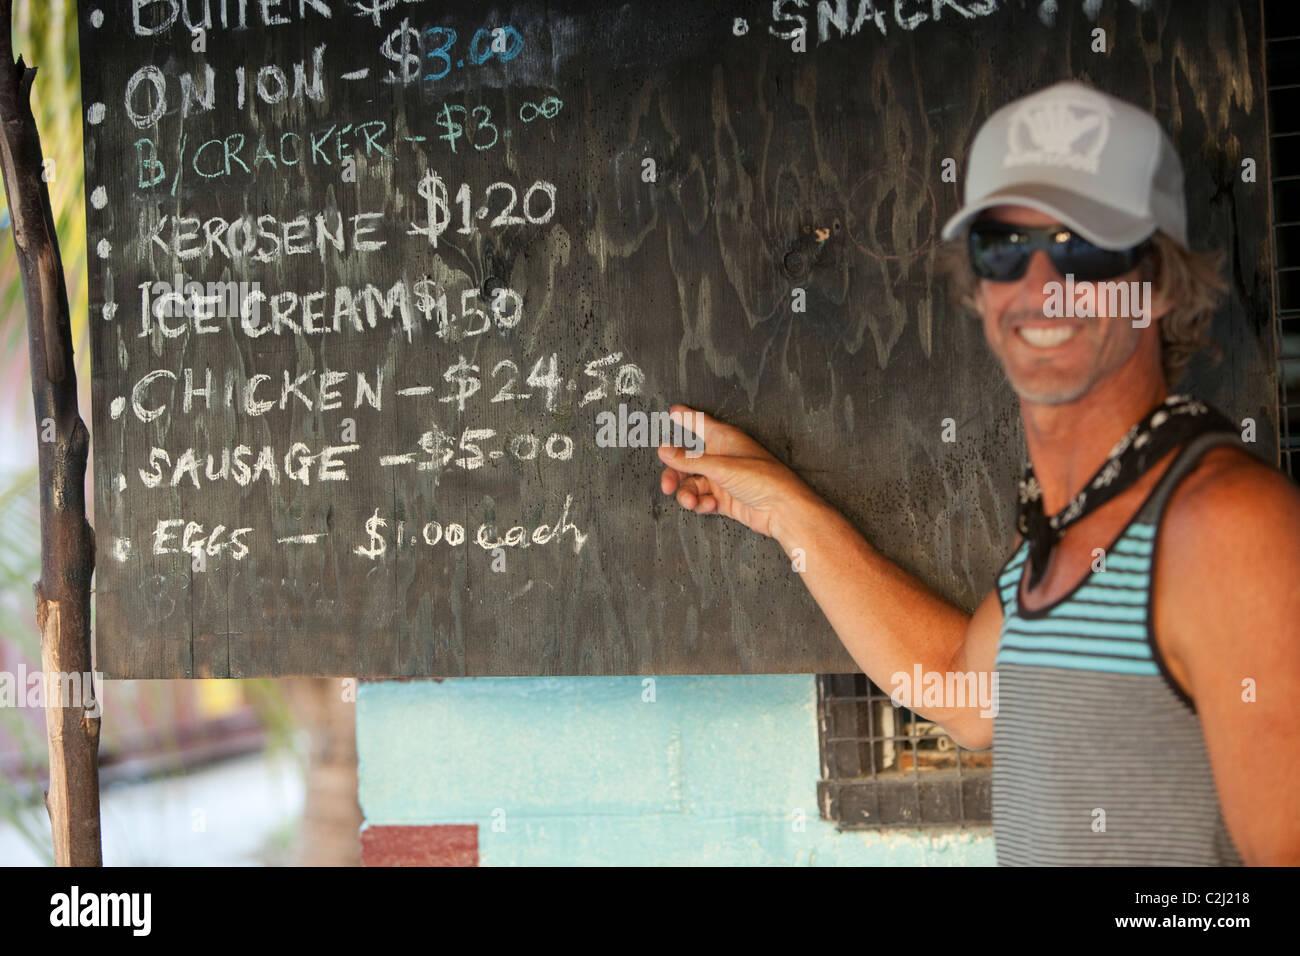 Brad Osborn on tour of island shop finds humor in price on menu board. - Stock Image